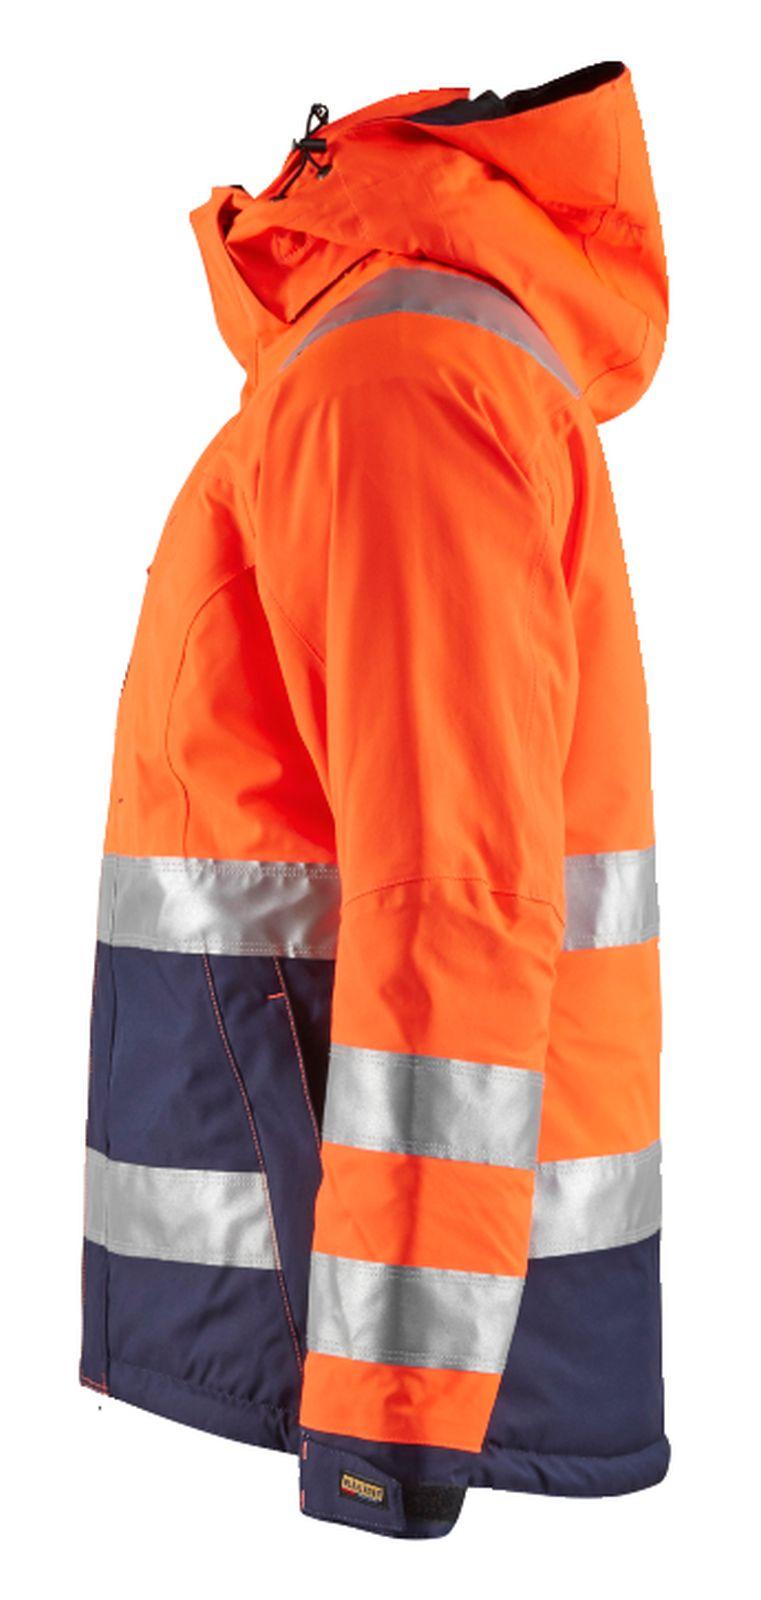 Blaklader Dames winterjacks 48721987 High Vis oranje-marineblauw(5389)